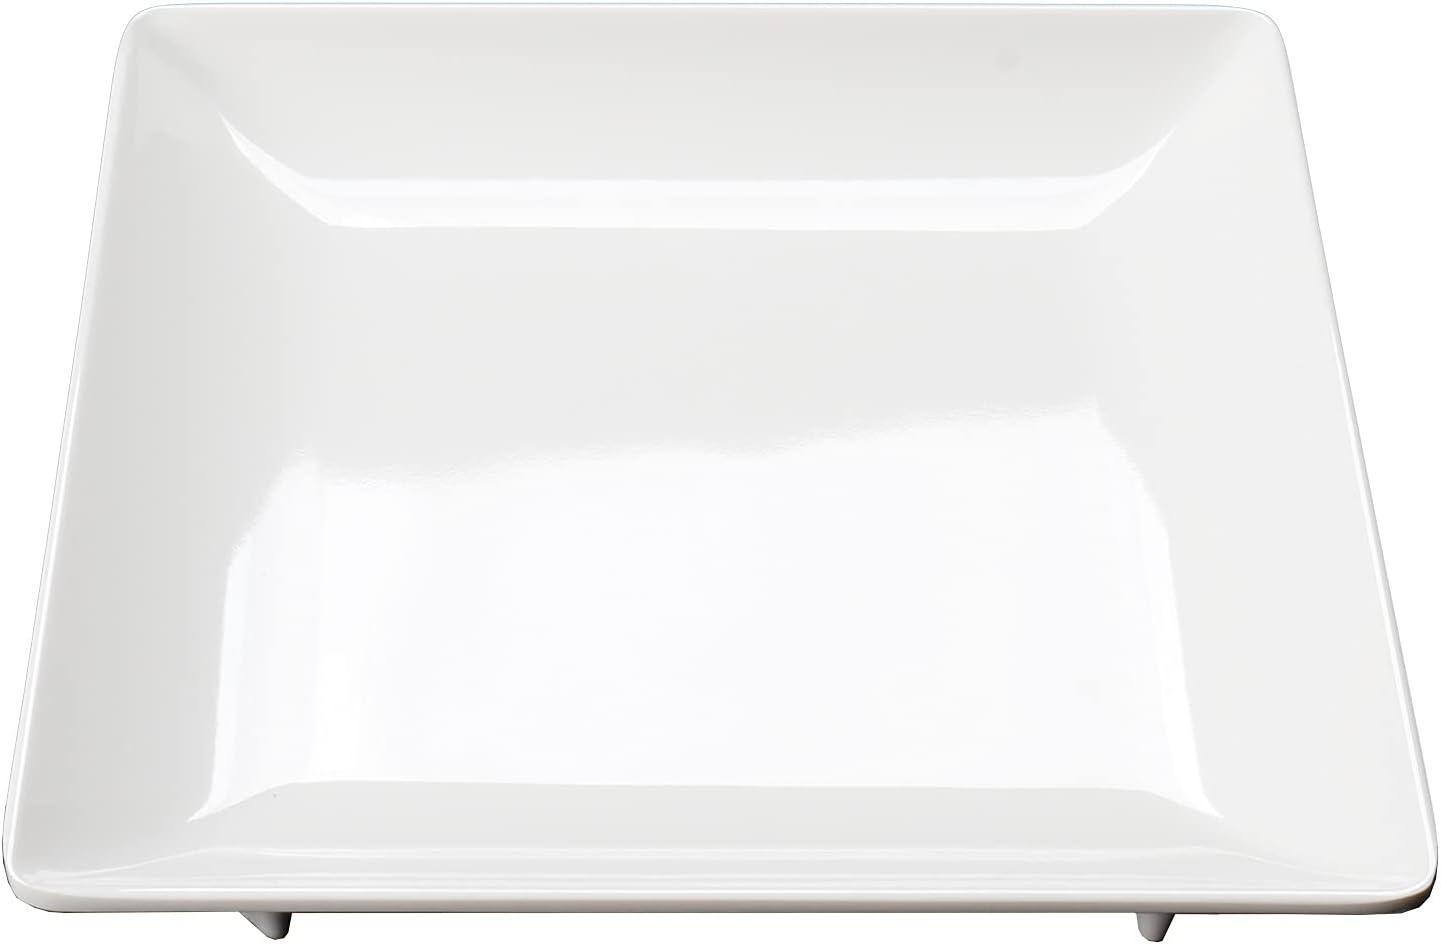 MBGWPP Melamine Product Plastic Square Unbreakable Rare Desser White Plates